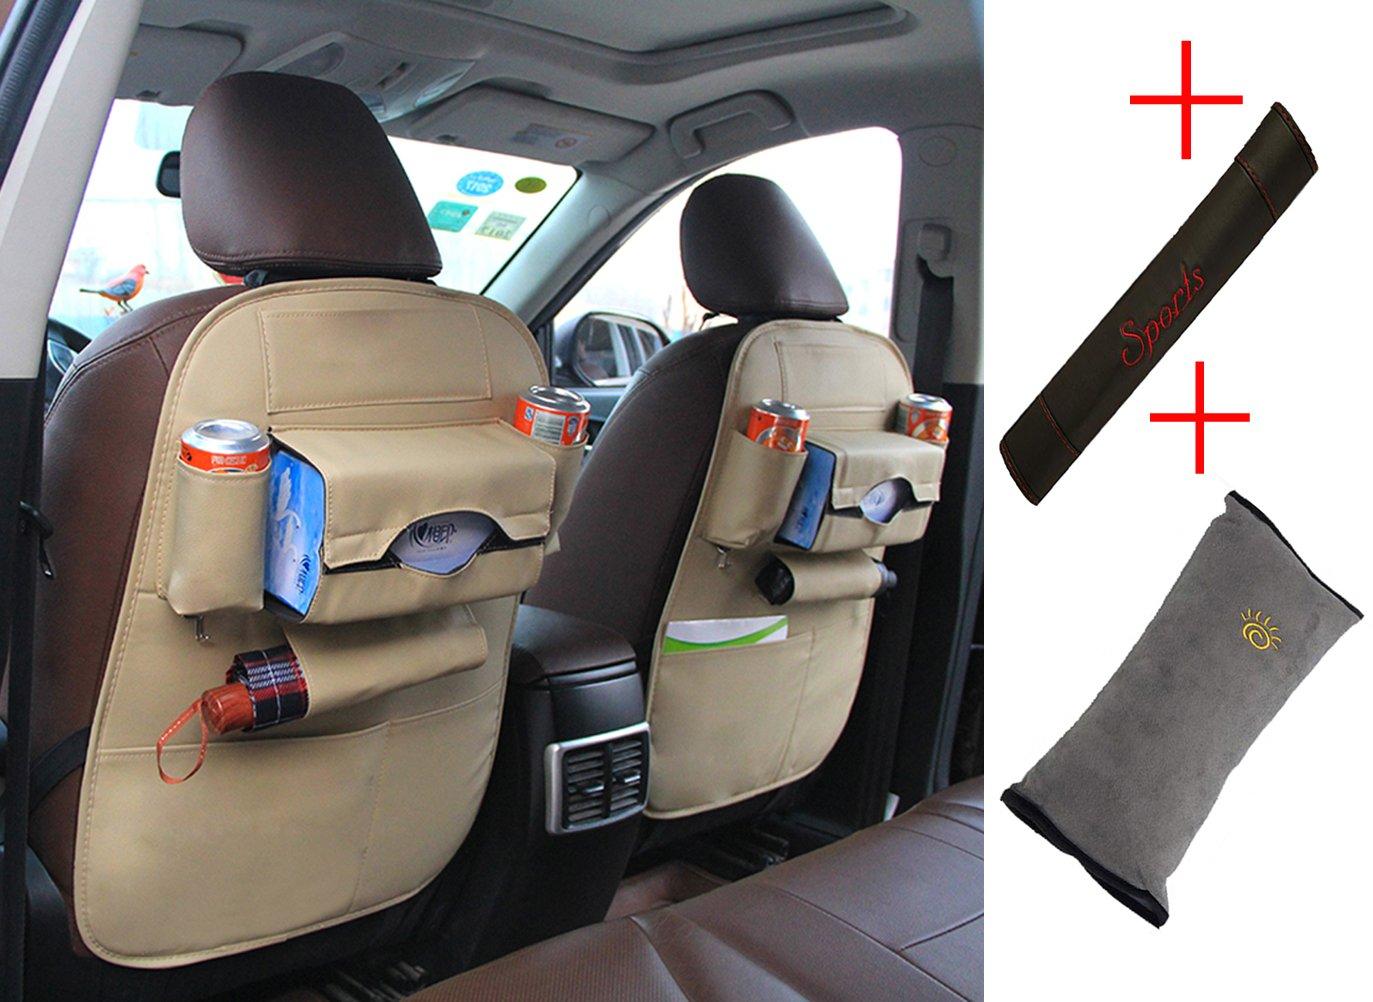 PU Leather Car Backseat Organizer, Seat Belt Shoulder, Children Seat Belt Pillow, 3-in-1 Package - Lamshine (Beige)